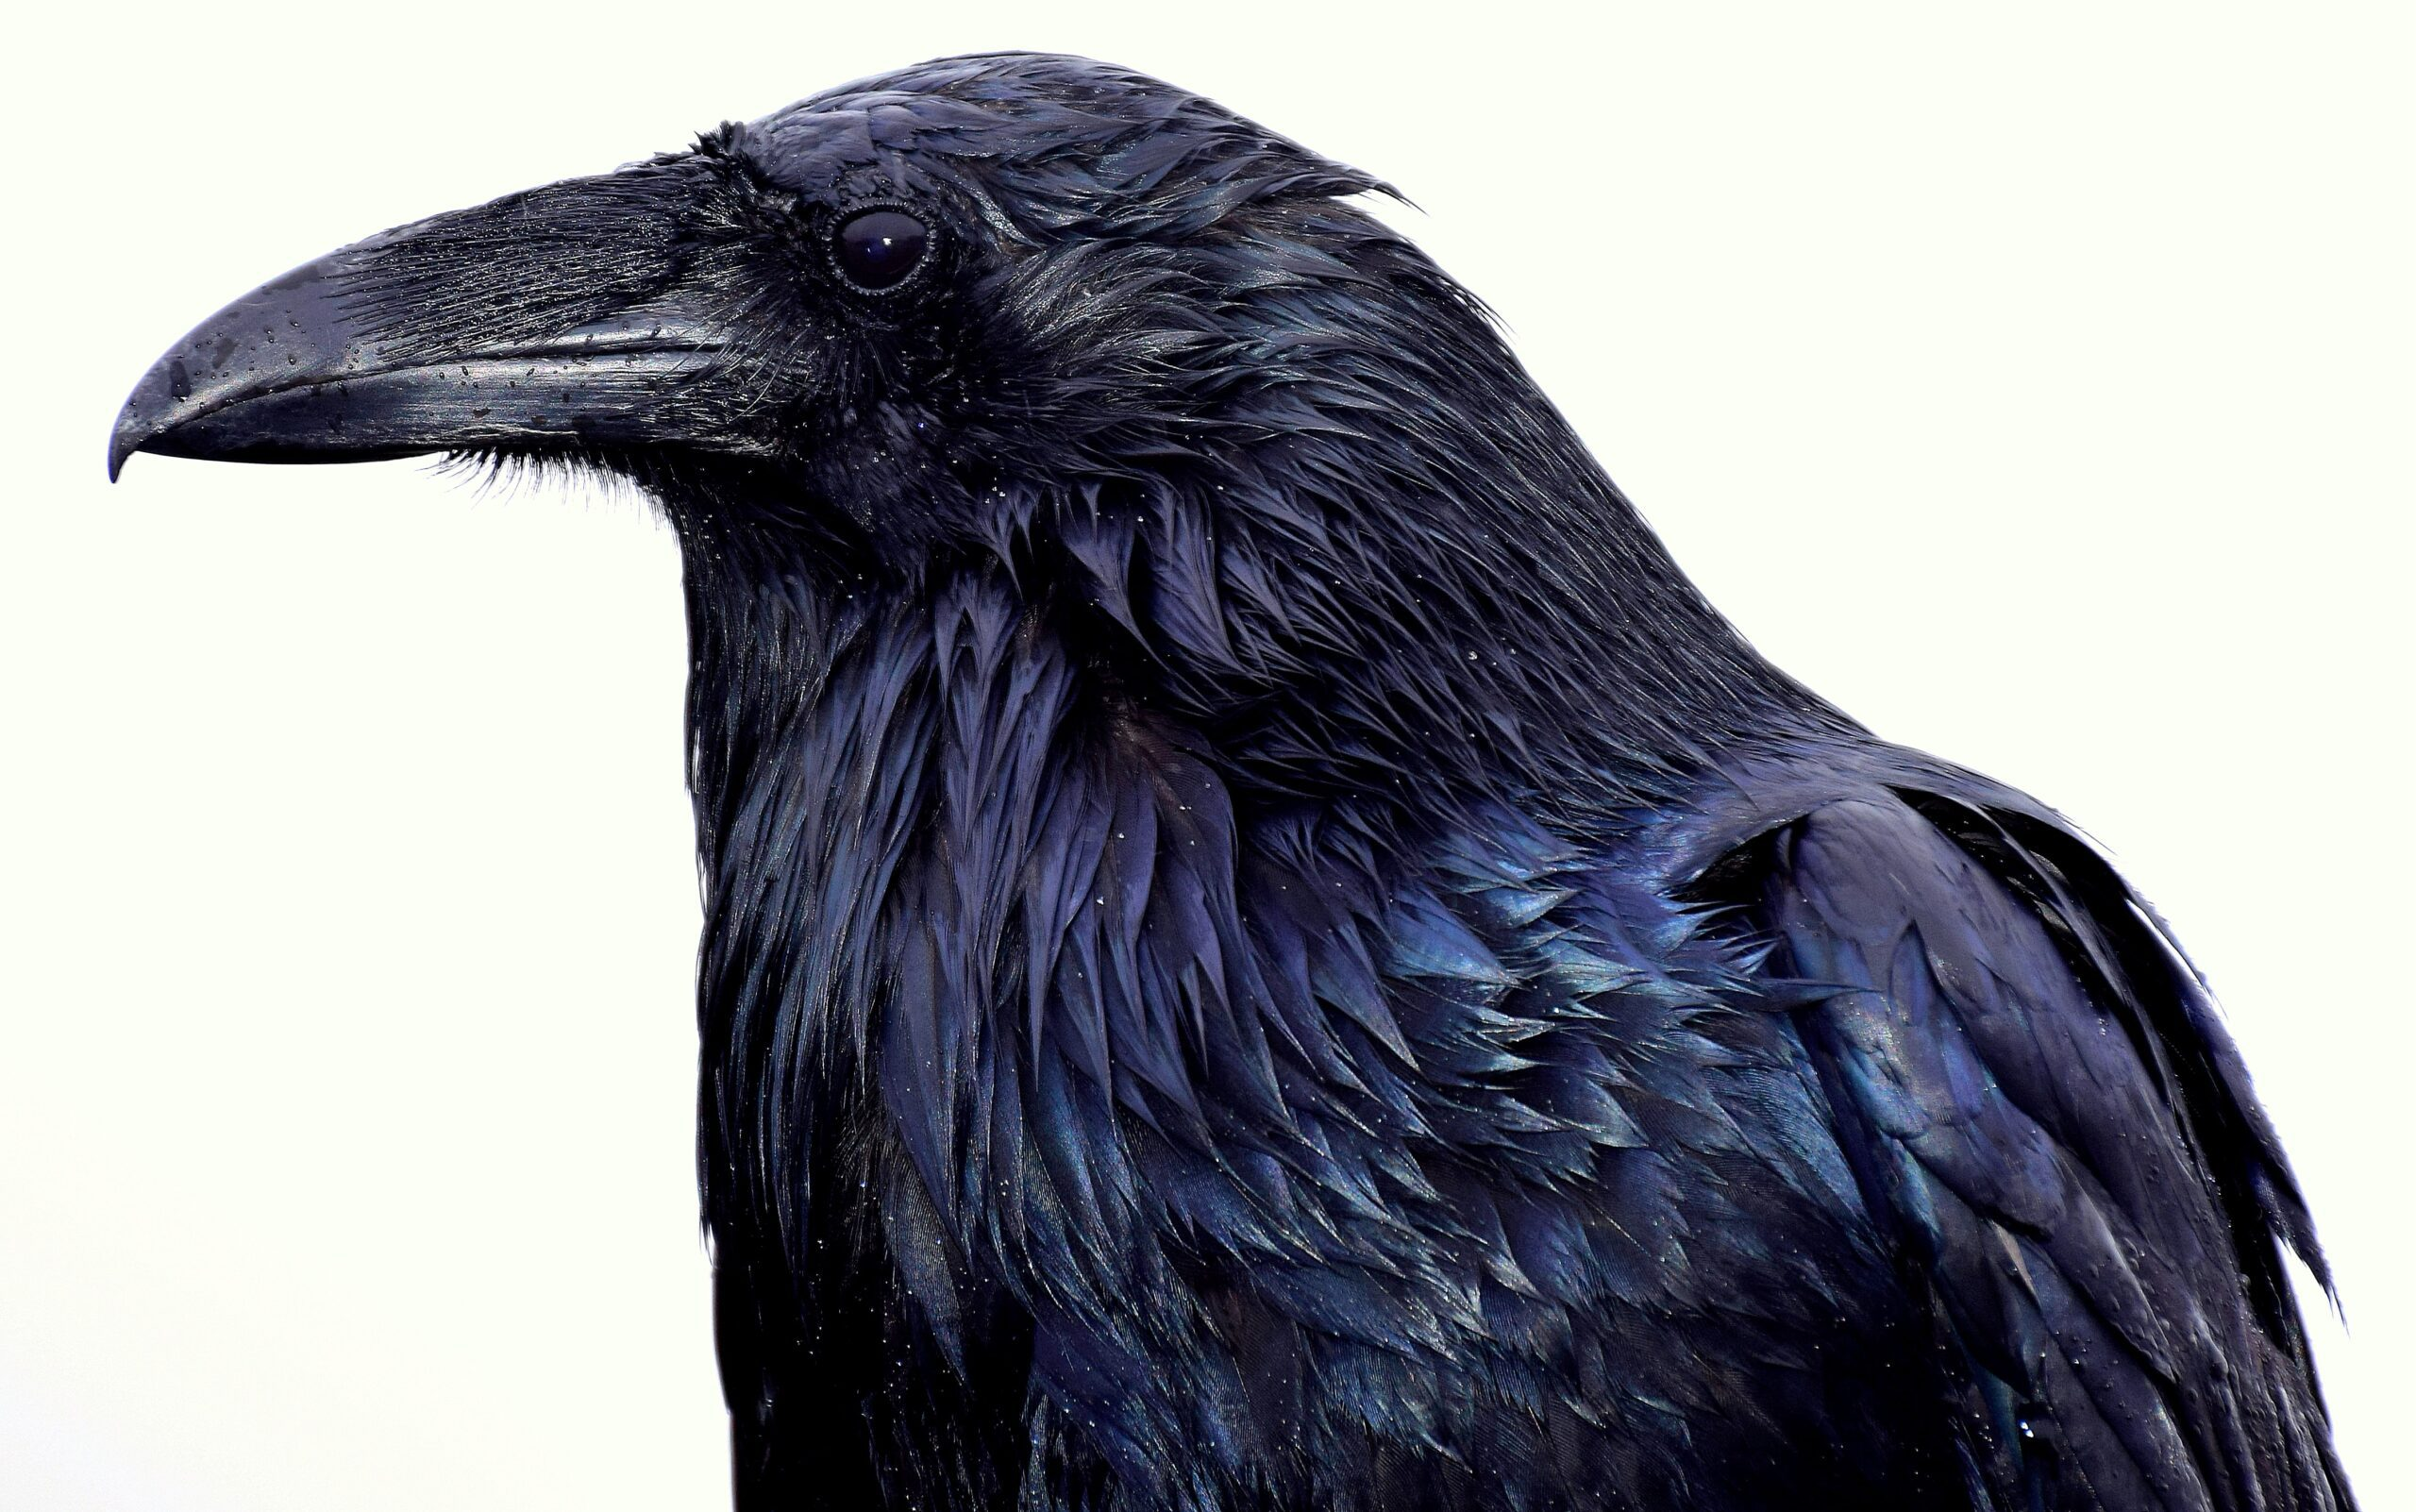 Raven by Meg Jerrard